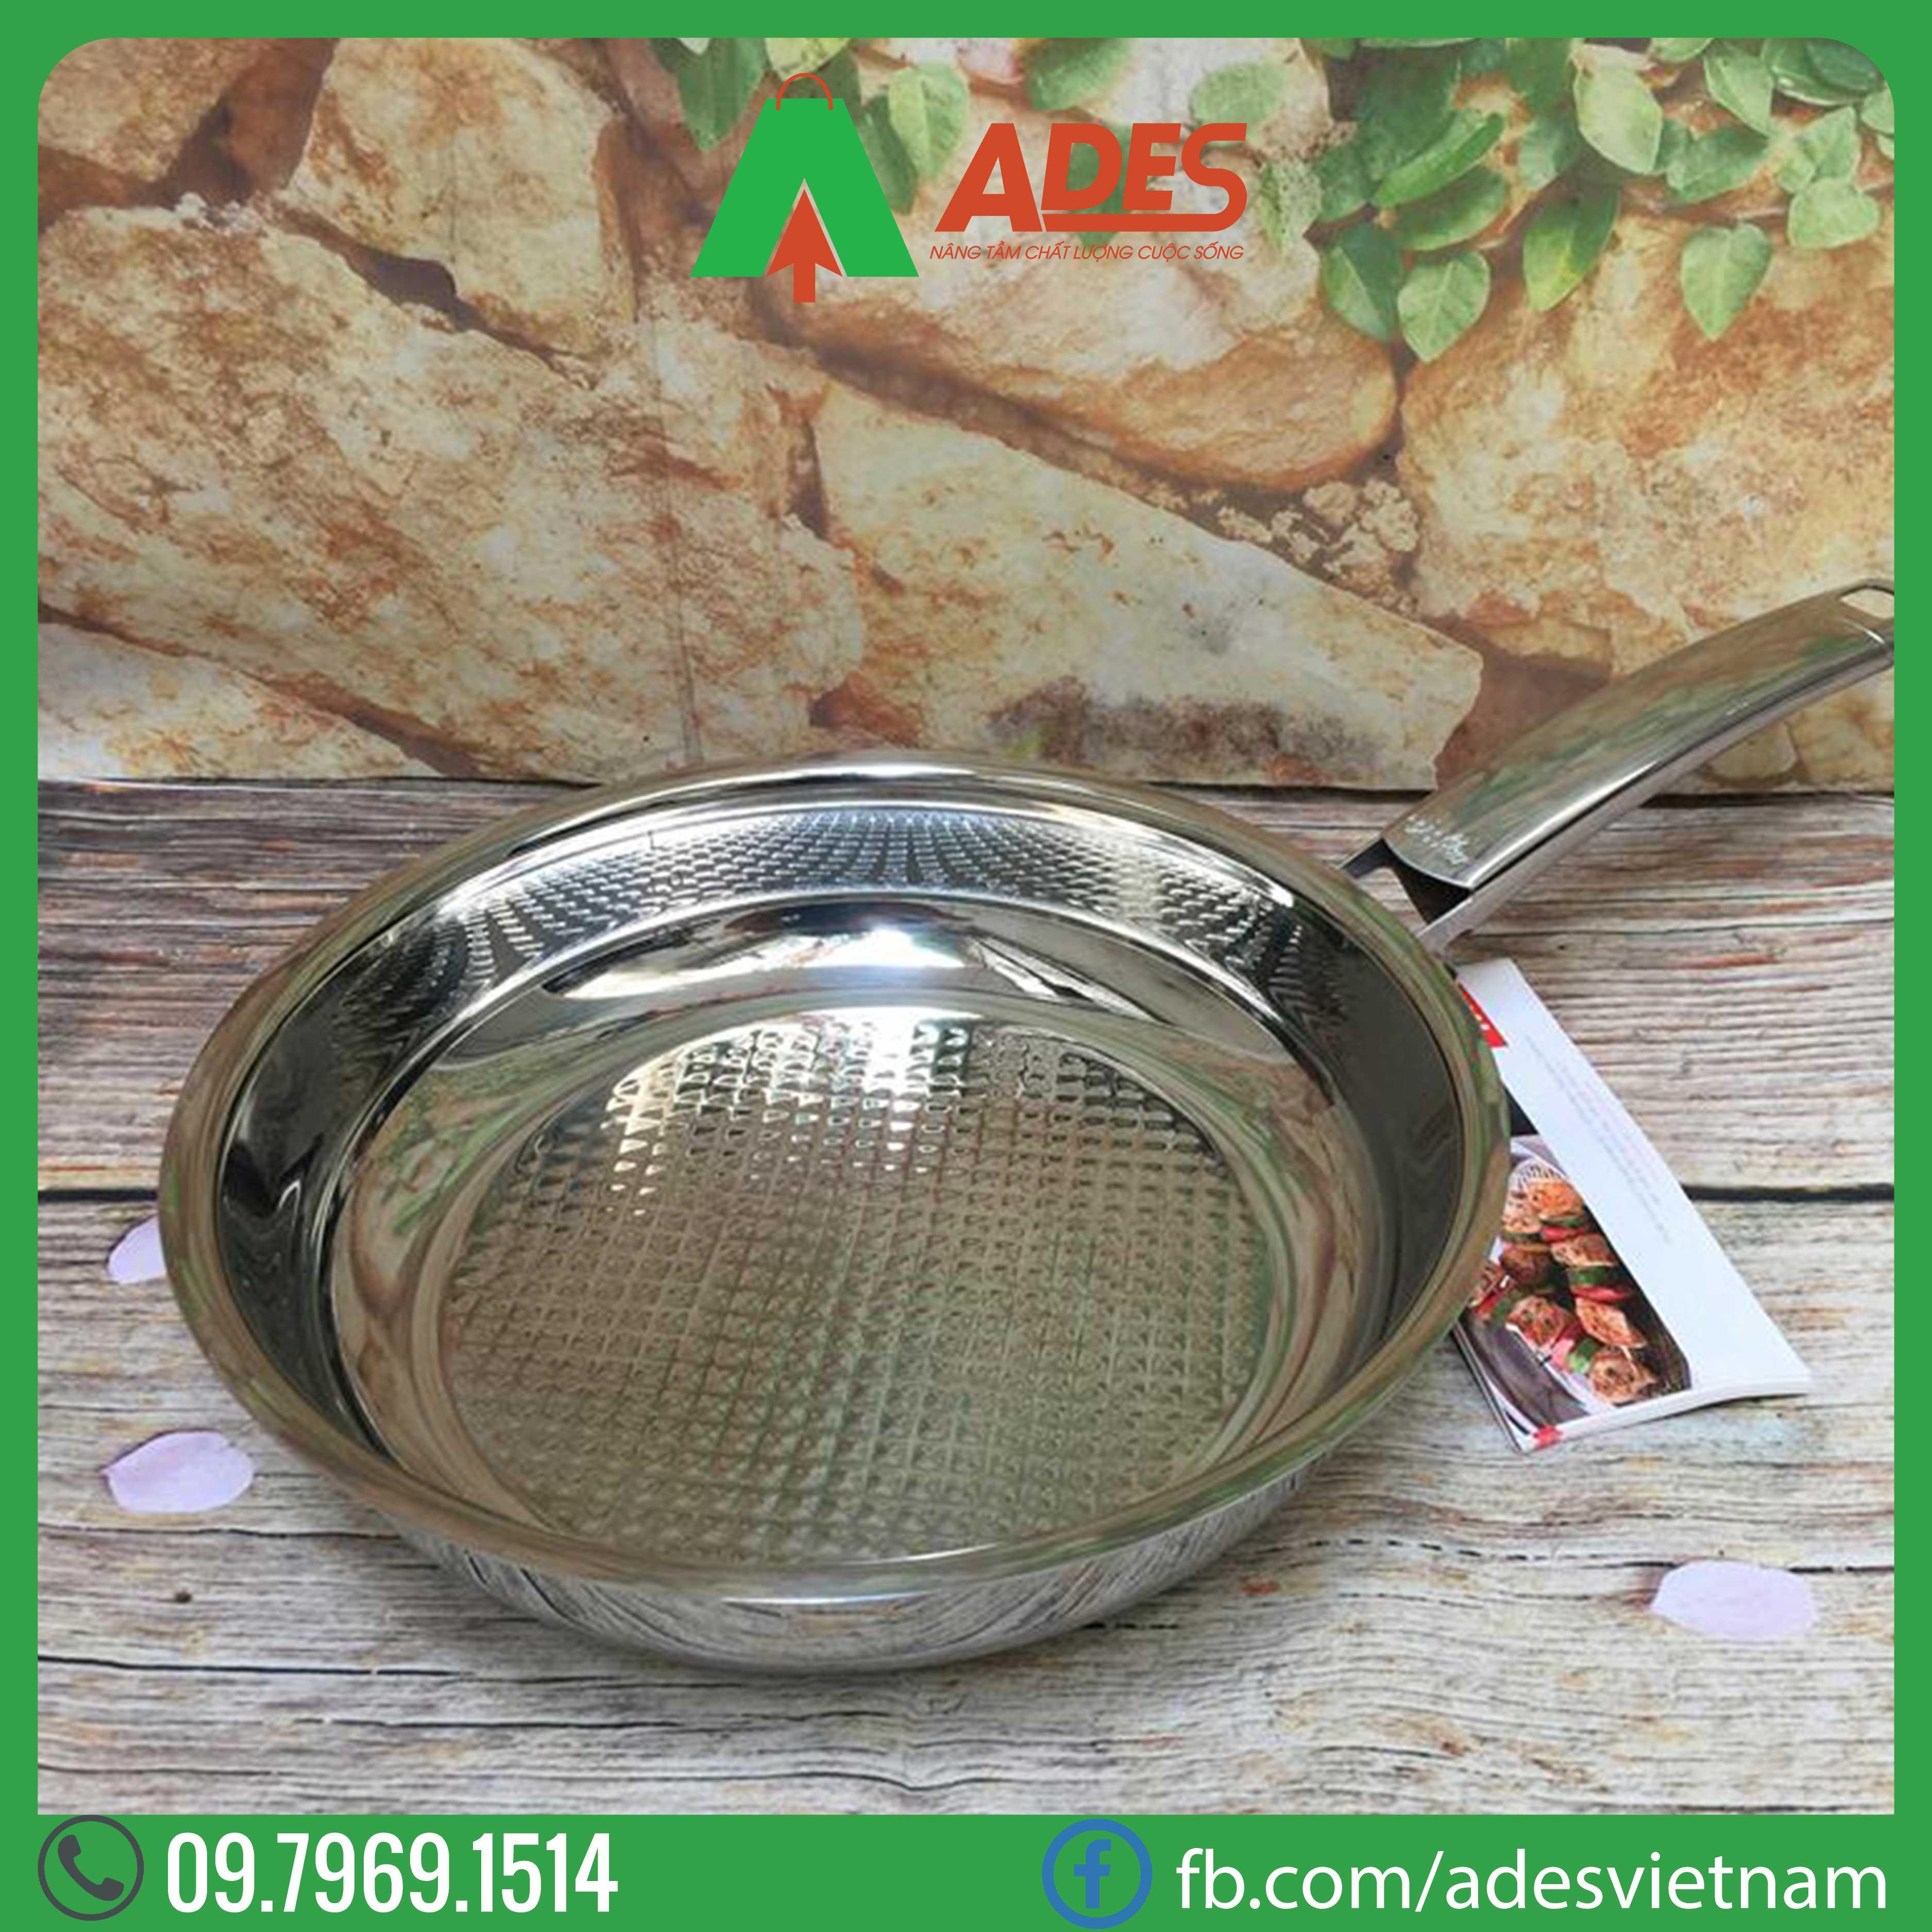 Chao Inox Fissler Steelux  28cm 121-101-28-100 Dien may ADES